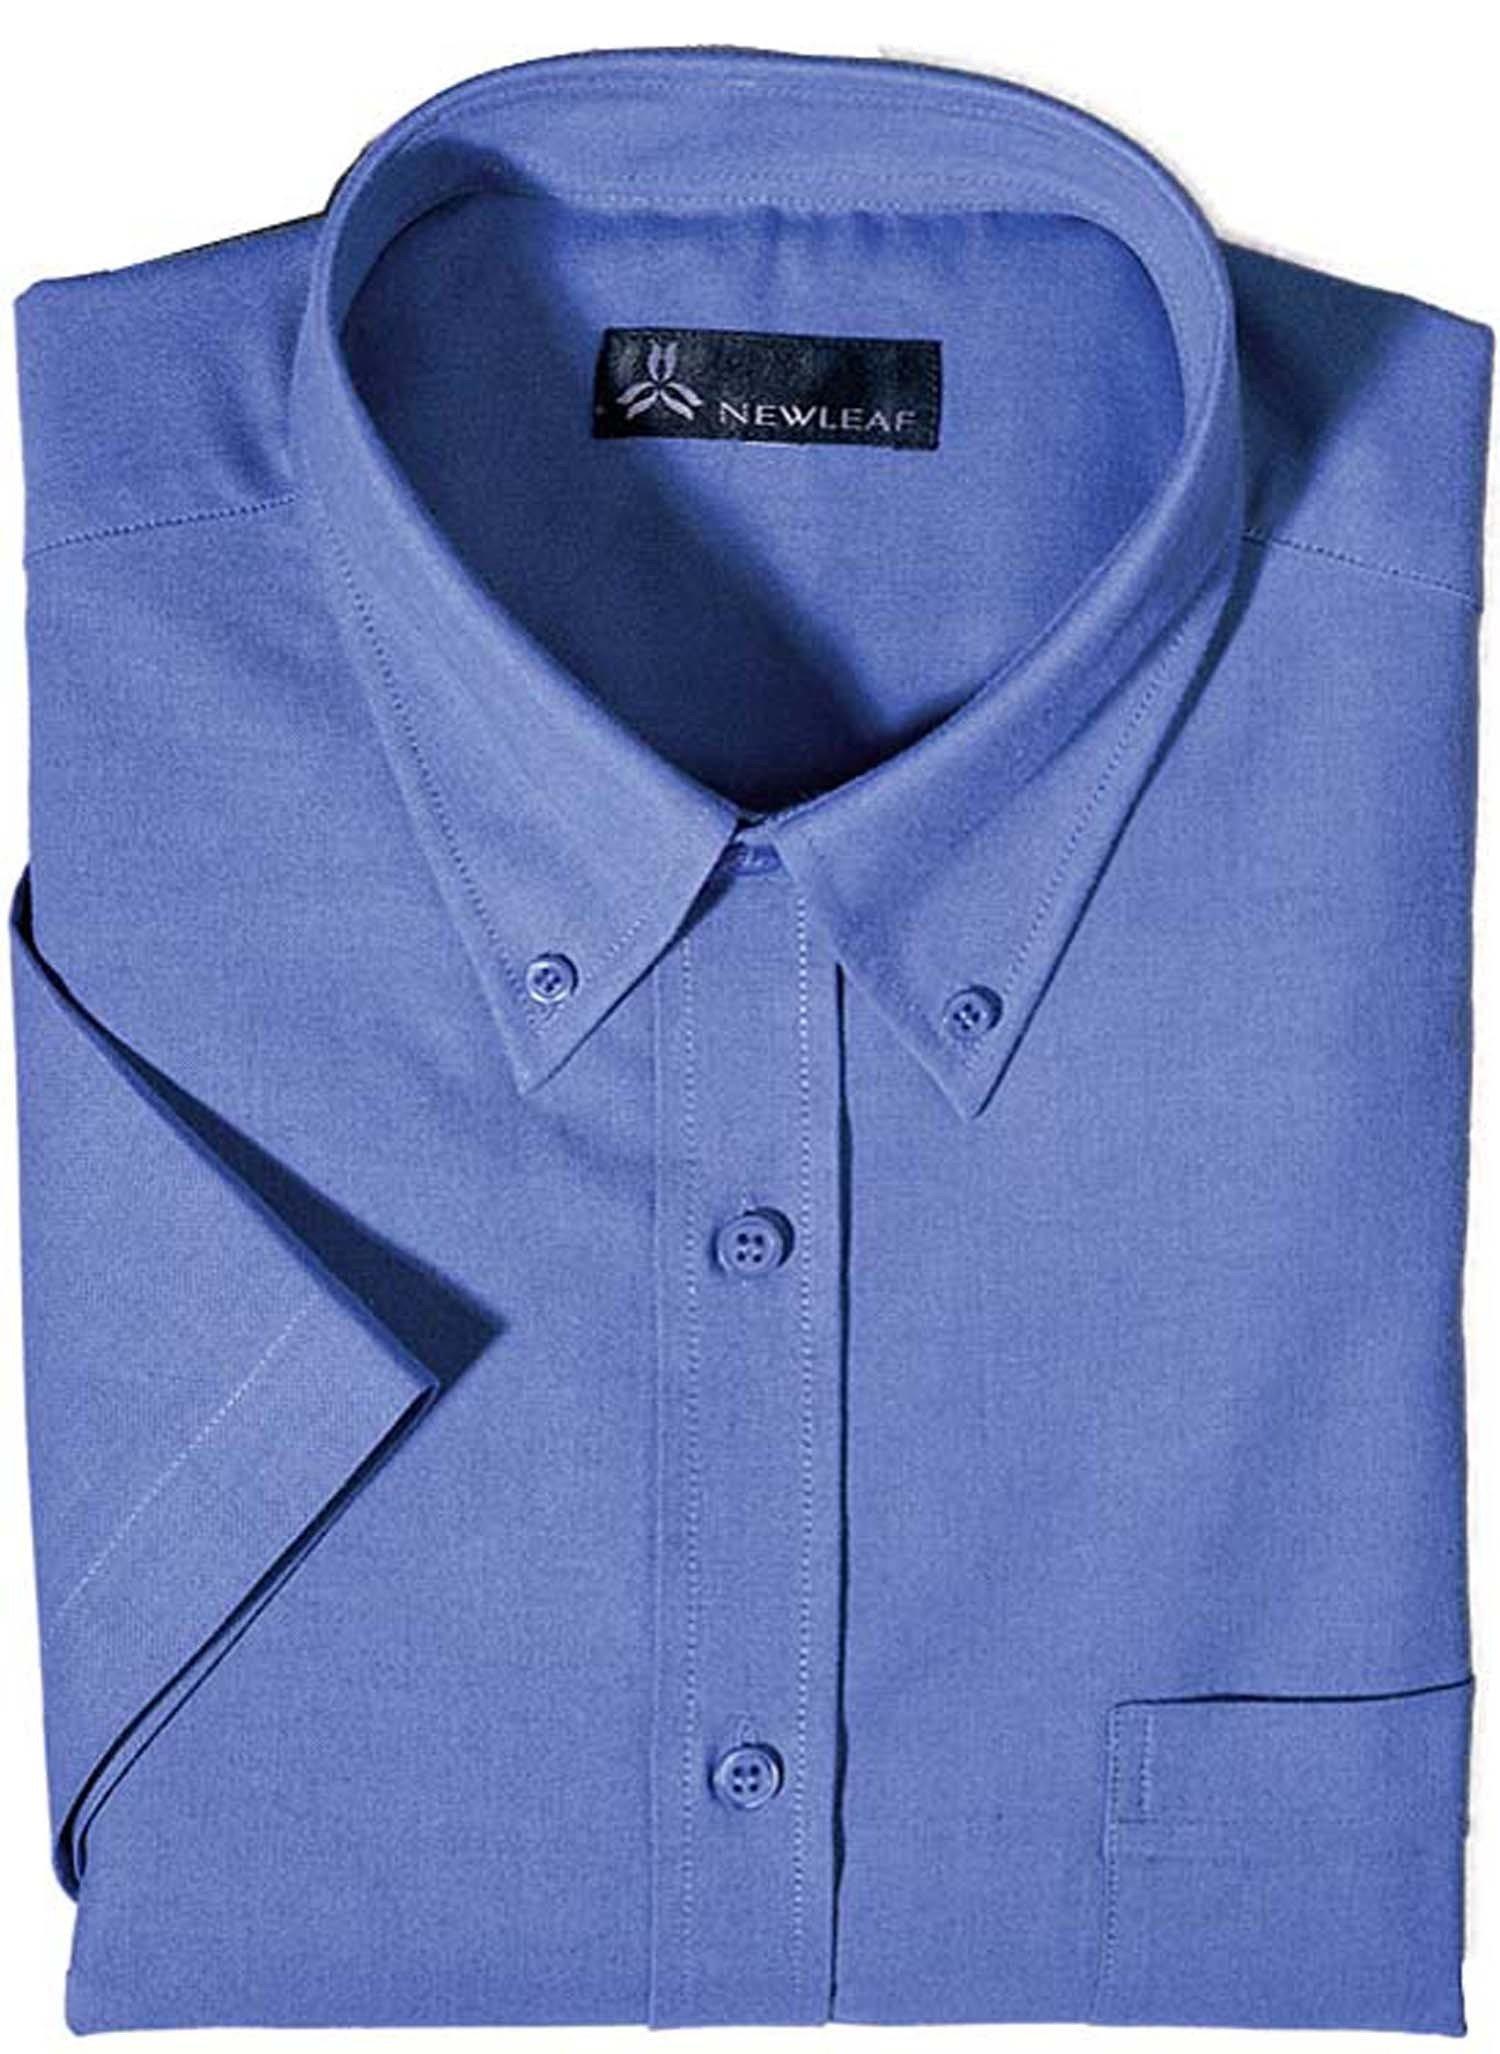 "H-LA-Hemd ""OXFORD"" blau 4546 047 - 1 - Ronja.ch"